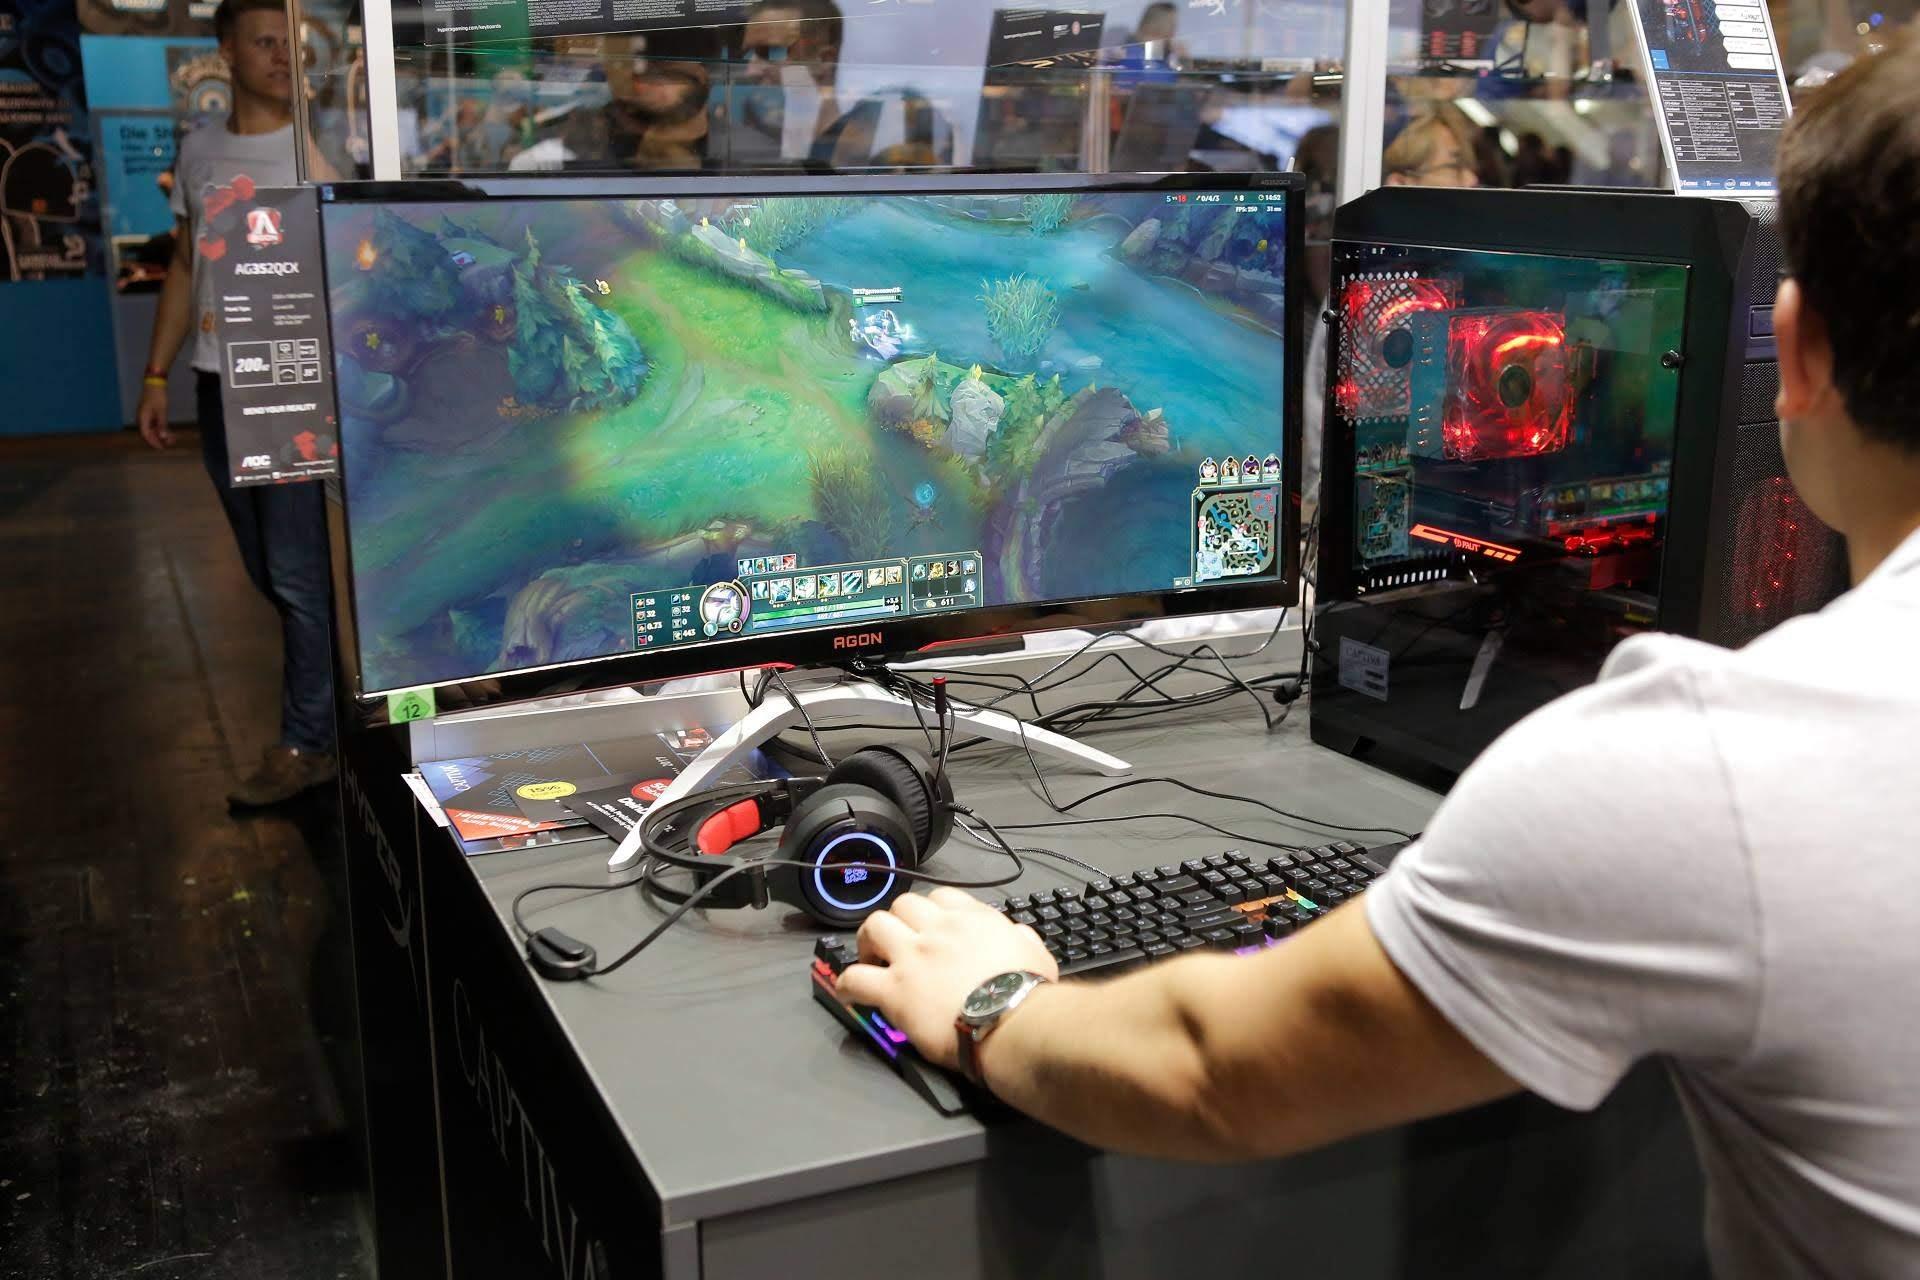 AOC z novimi gaming monitorji na sejmu Gamescom v Kölnu